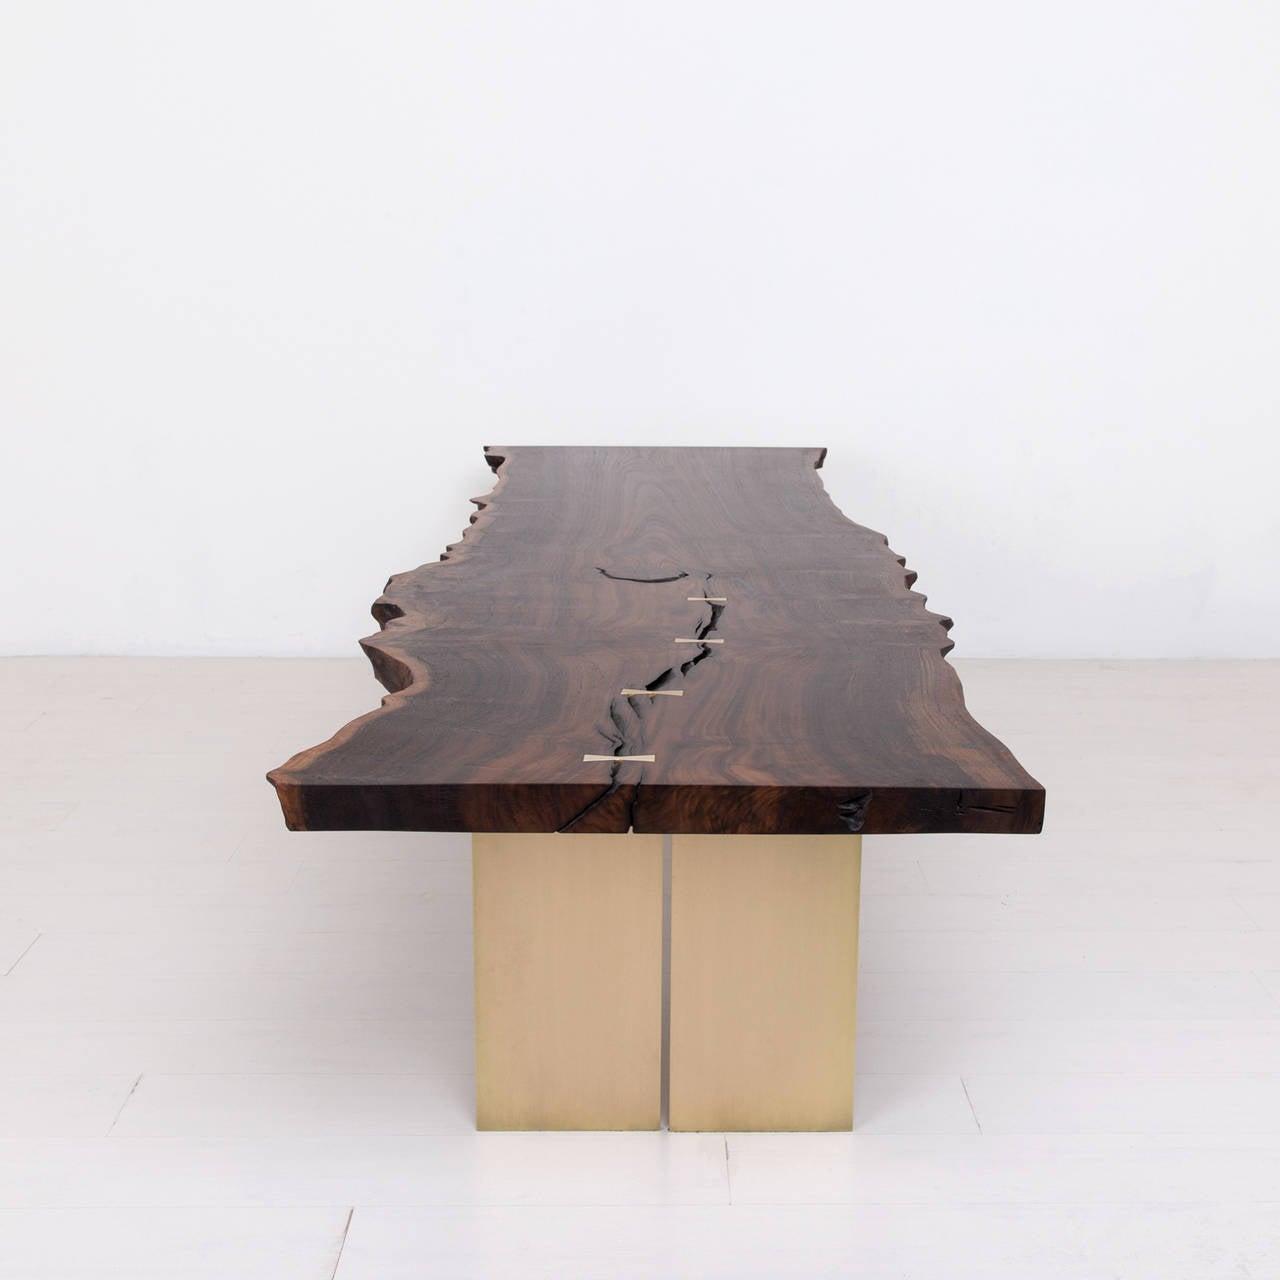 Milo Base Dining Table by Uhuru Design, claro walnut, brass 5